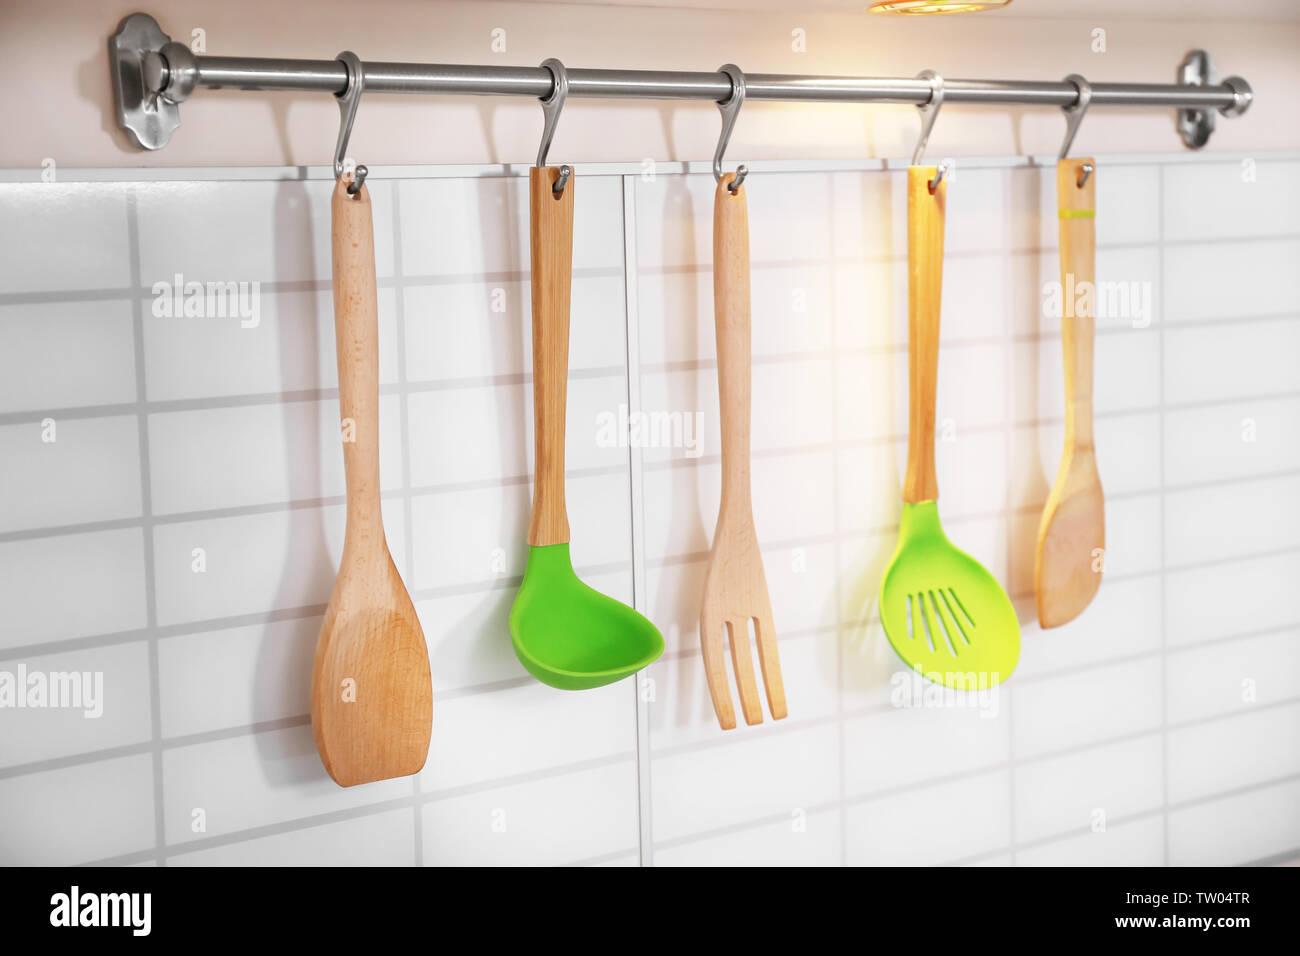 Set of utensils on kitchen - Stock Image